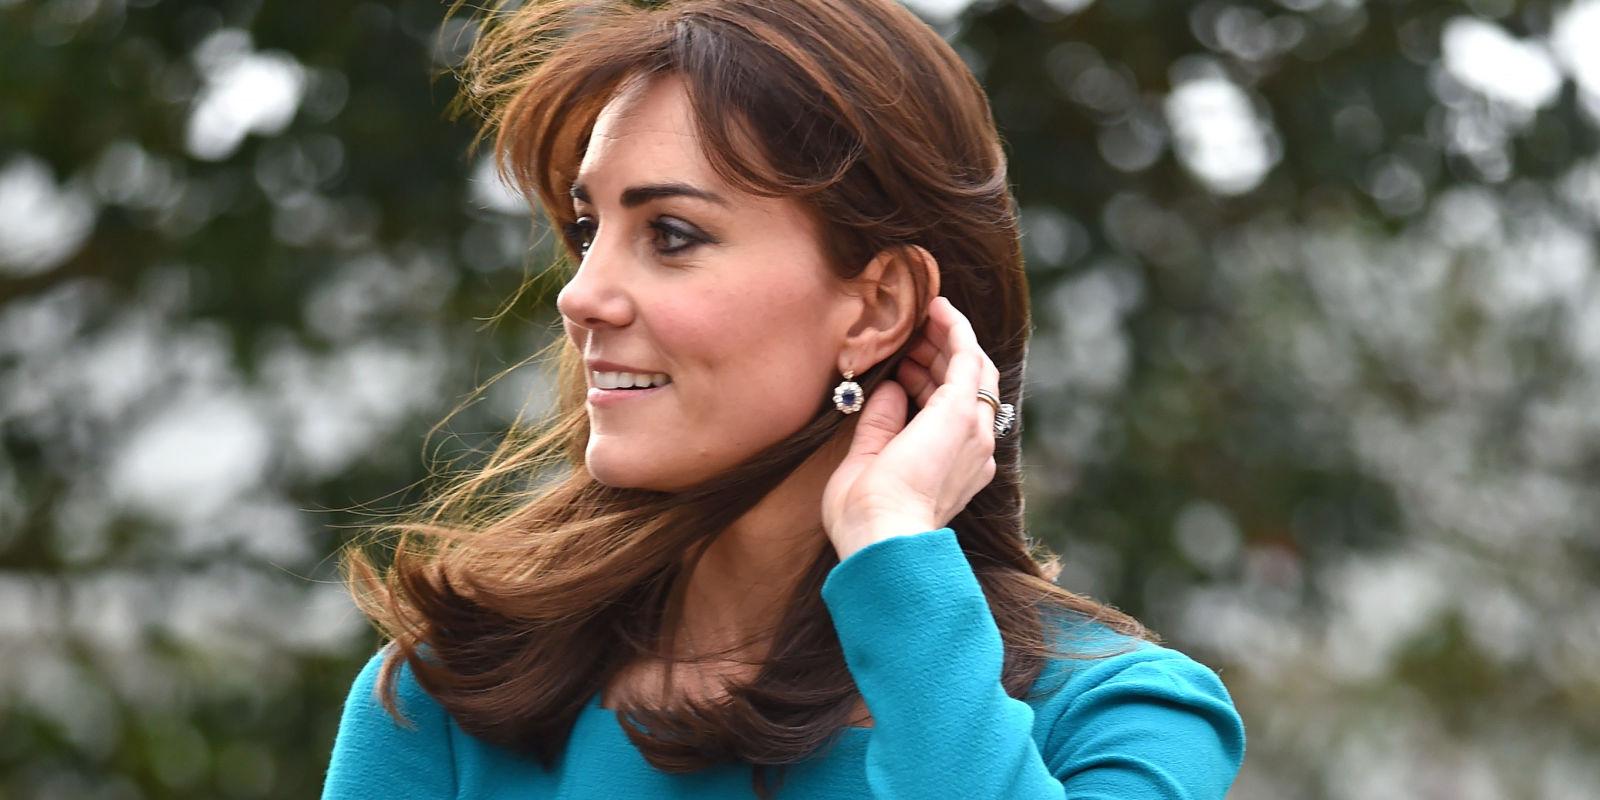 Kate Middleton Buys Surprising Christmas Gifts This Year